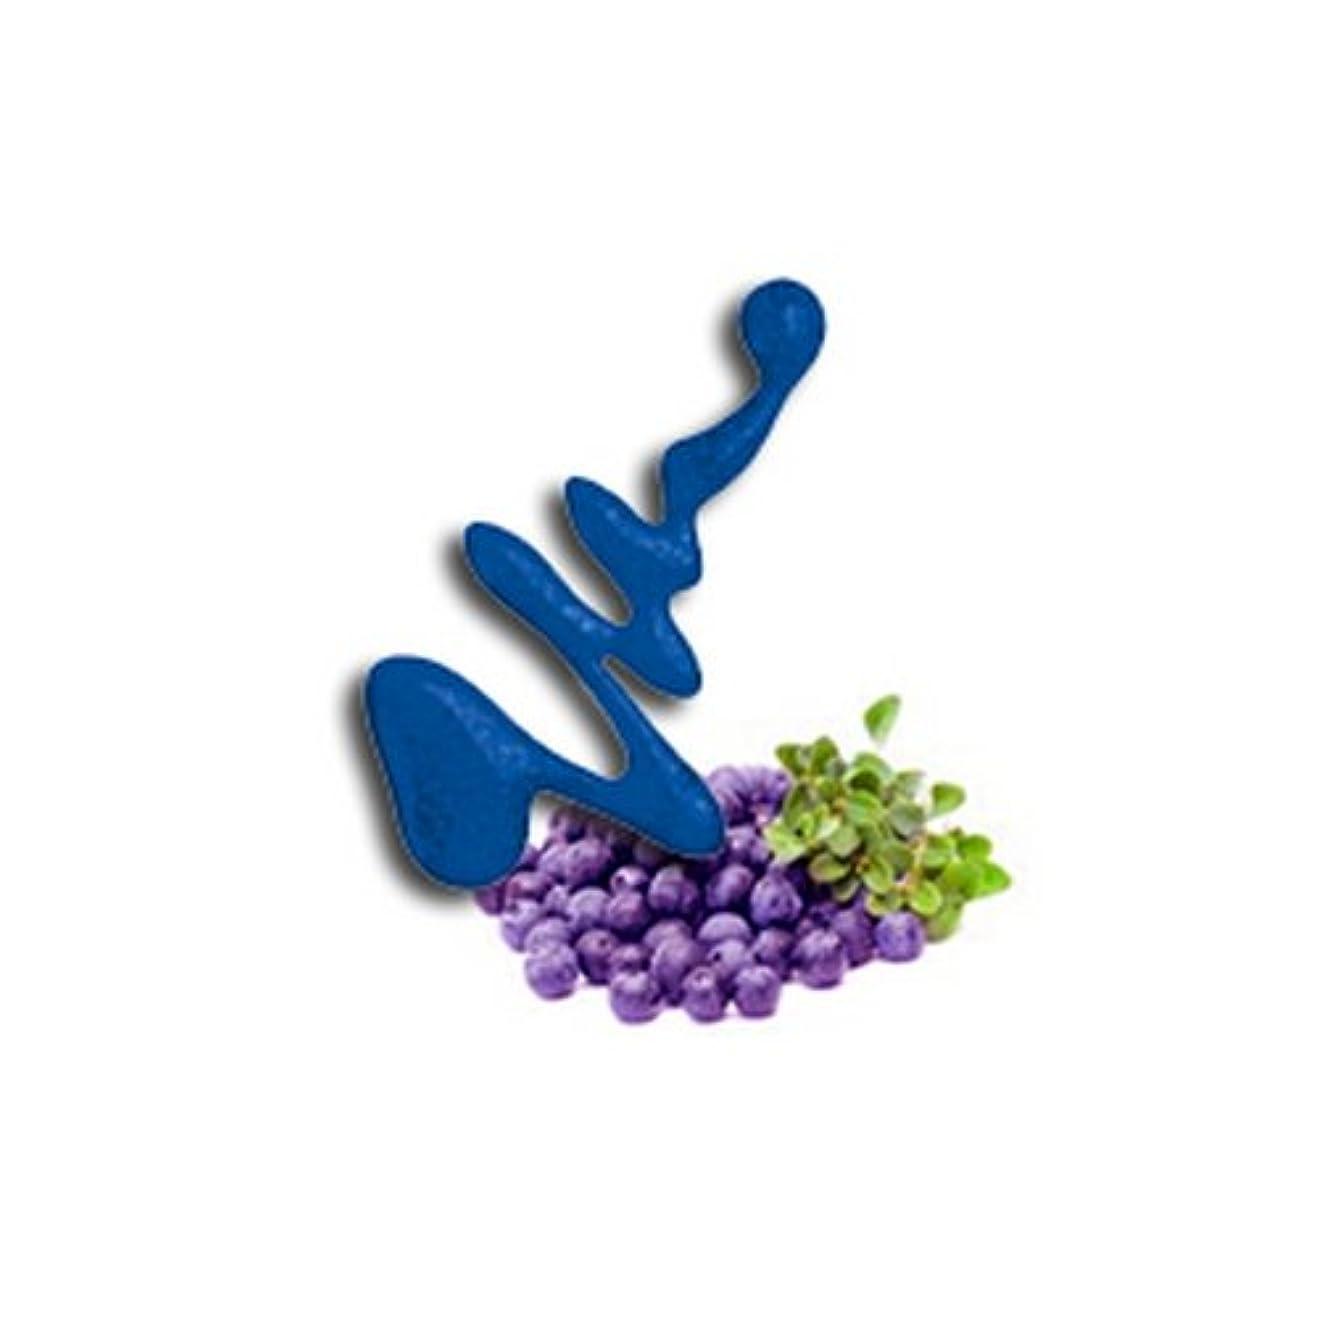 崖成功珍味(6 Pack) LA GIRL Fruity Scented Nail Polish - Blueberry Fizz (並行輸入品)